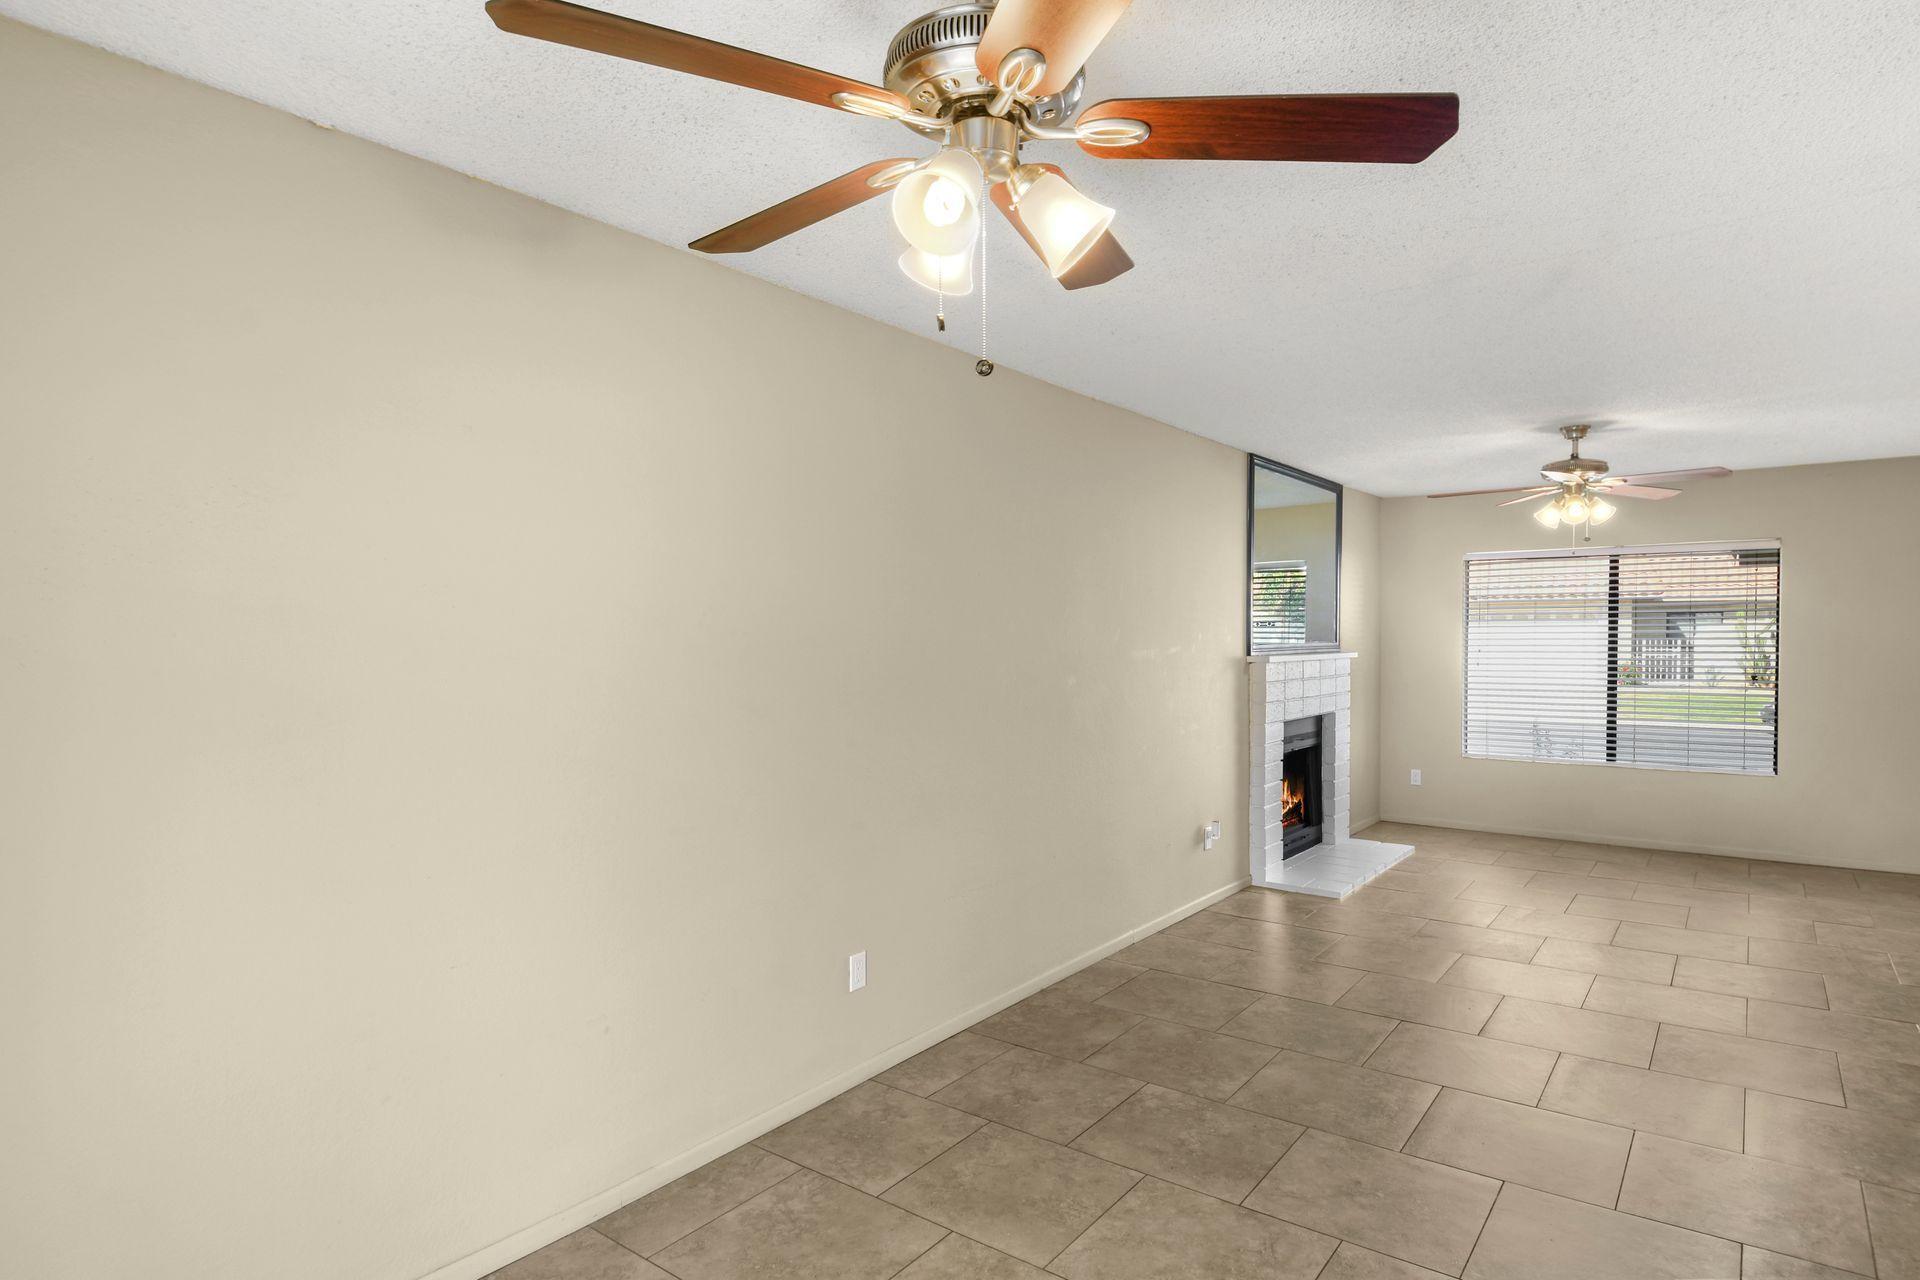 75245 Vista Corona, Palm Desert, California 92211, 3 Bedrooms Bedrooms, ,2 BathroomsBathrooms,Residential,For Sale,75245 Vista Corona,219041572